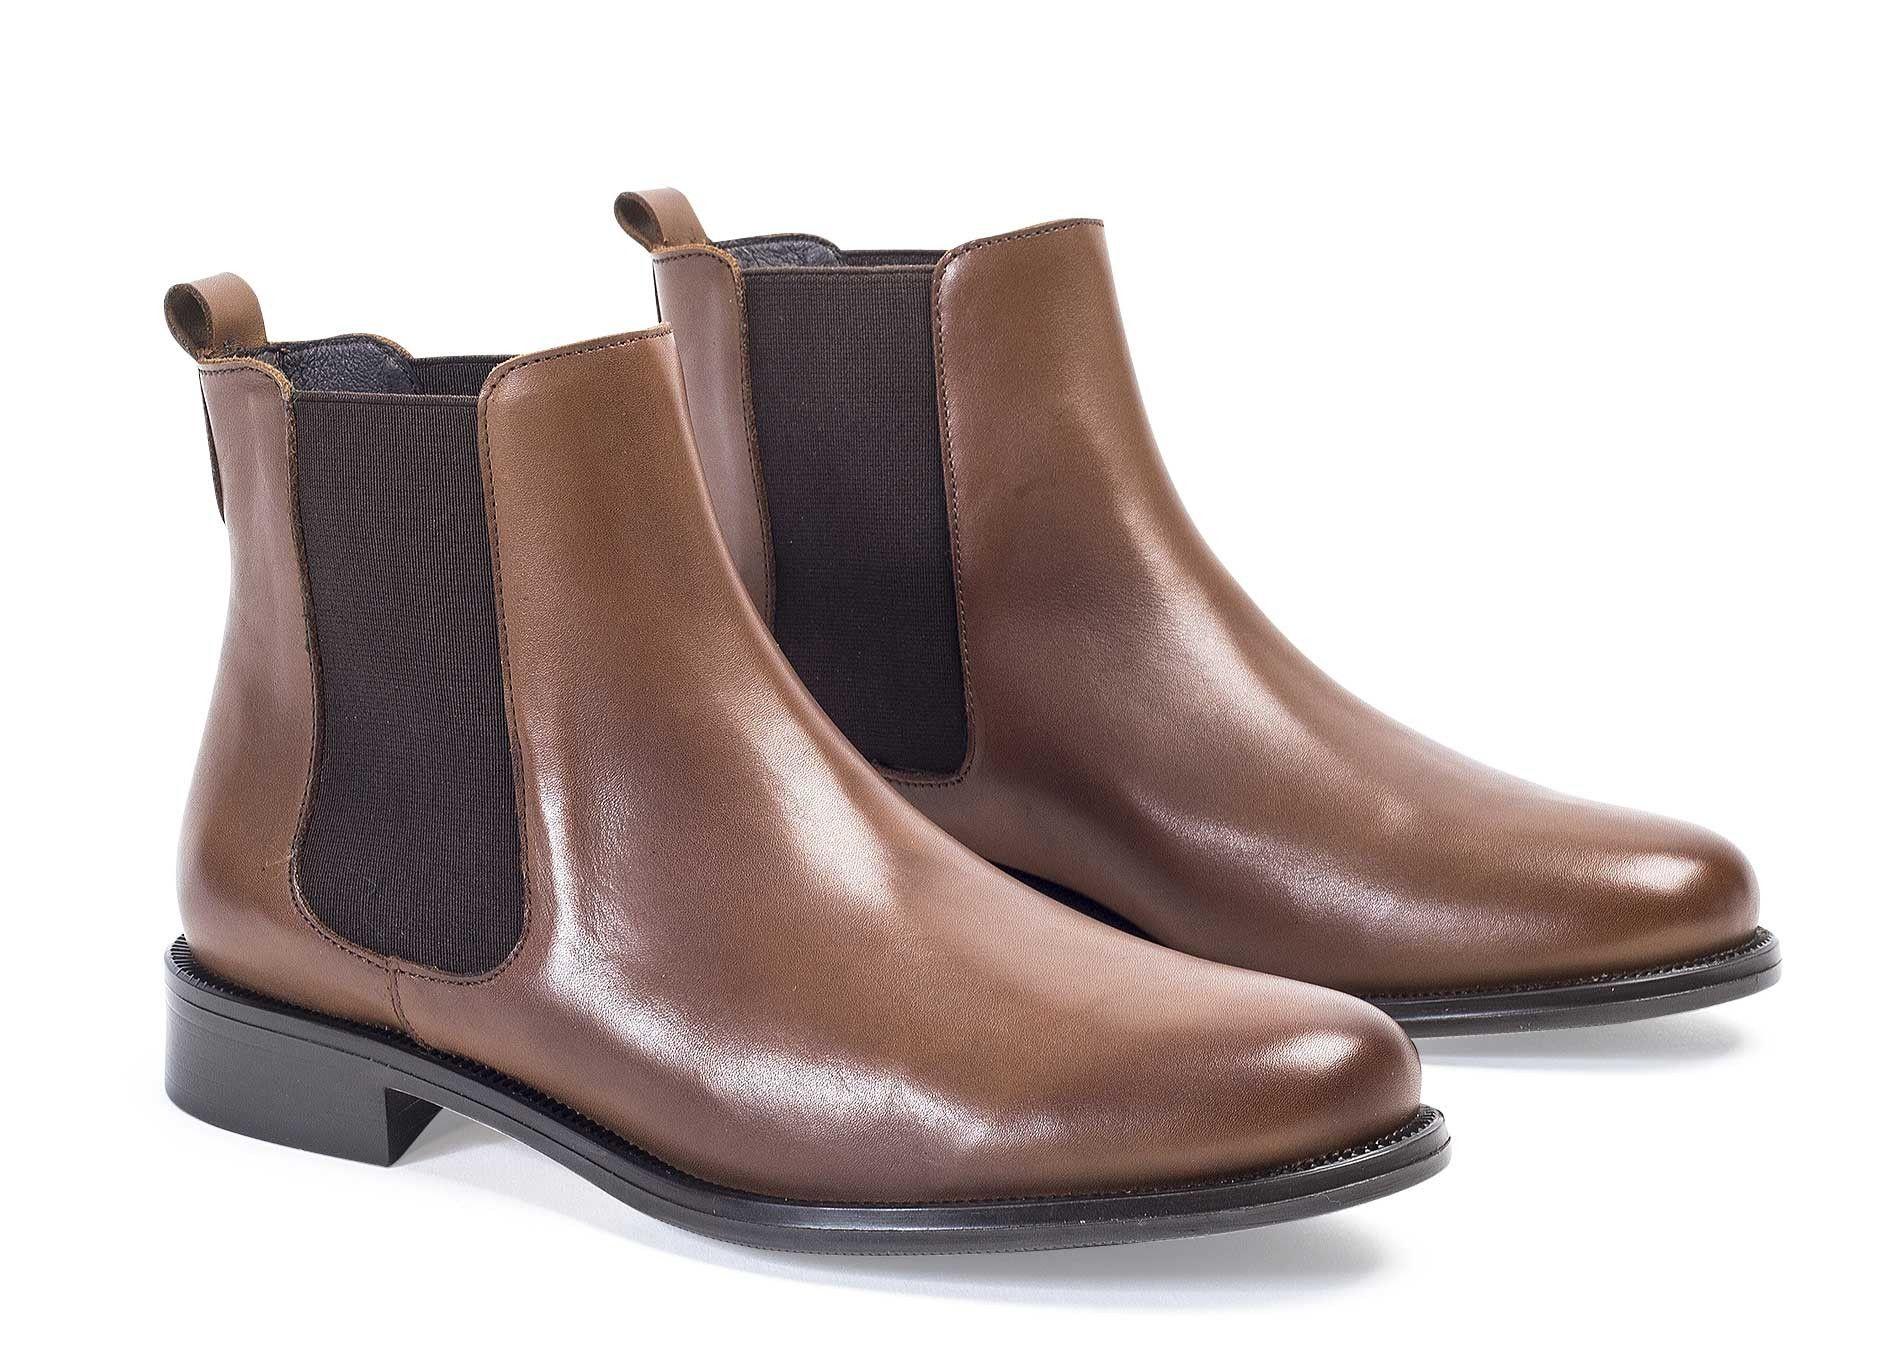 Chaussures, Sacs, Accessoires PIKOLINOS Chaussure pas cher